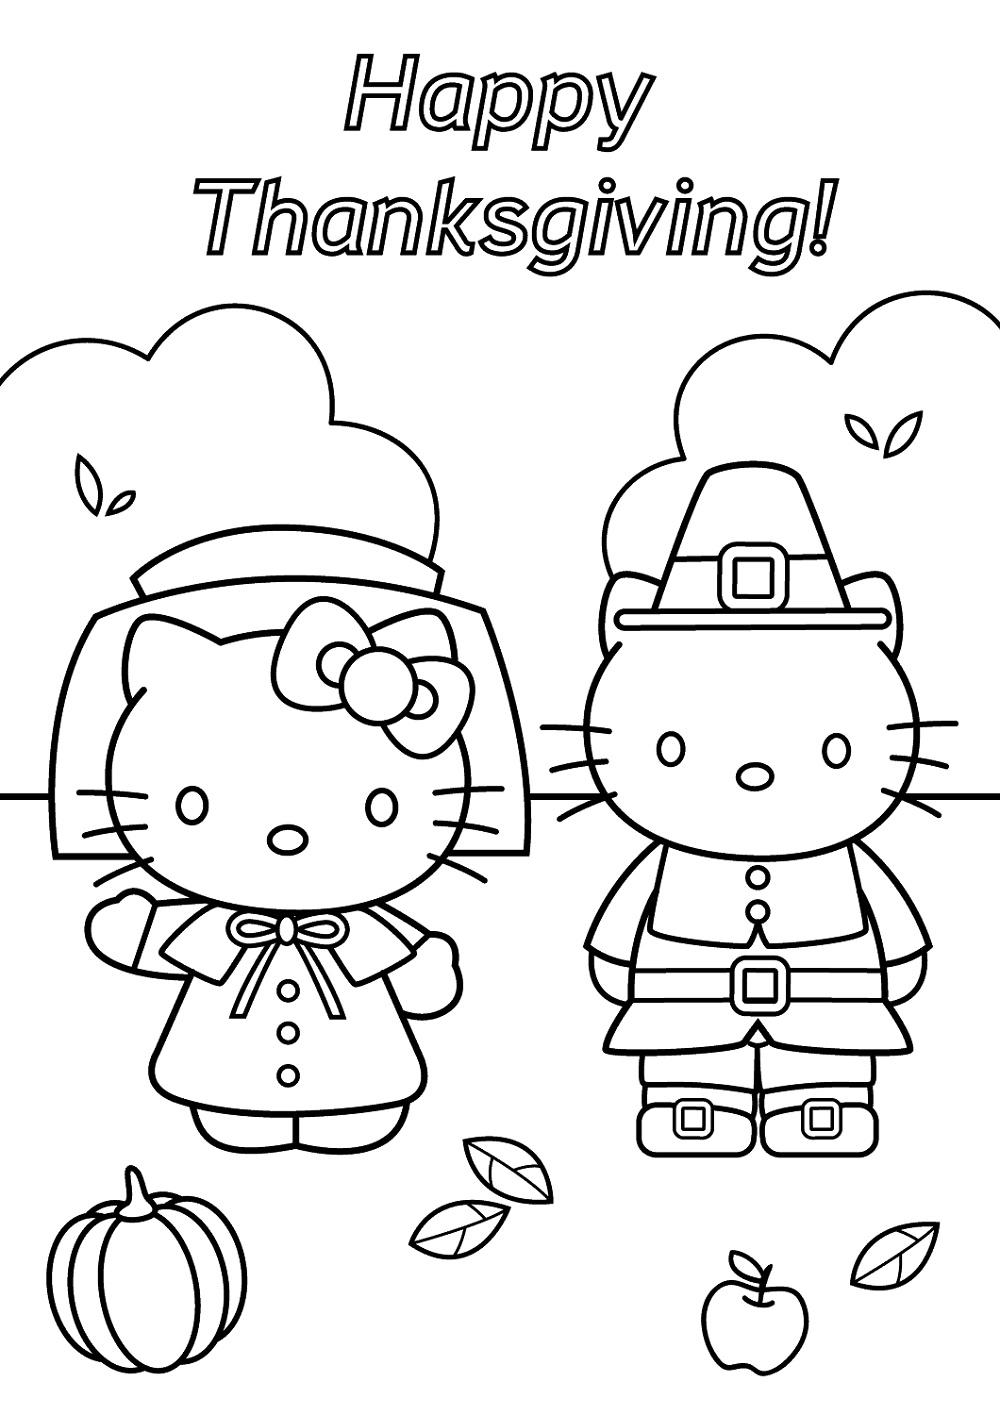 Thanksgiving Coloring Sheets Hello Kitty Hello Kitty Coloring Hello Kitty Colouring Pages Thanksgiving Coloring Pages [ 1415 x 1000 Pixel ]